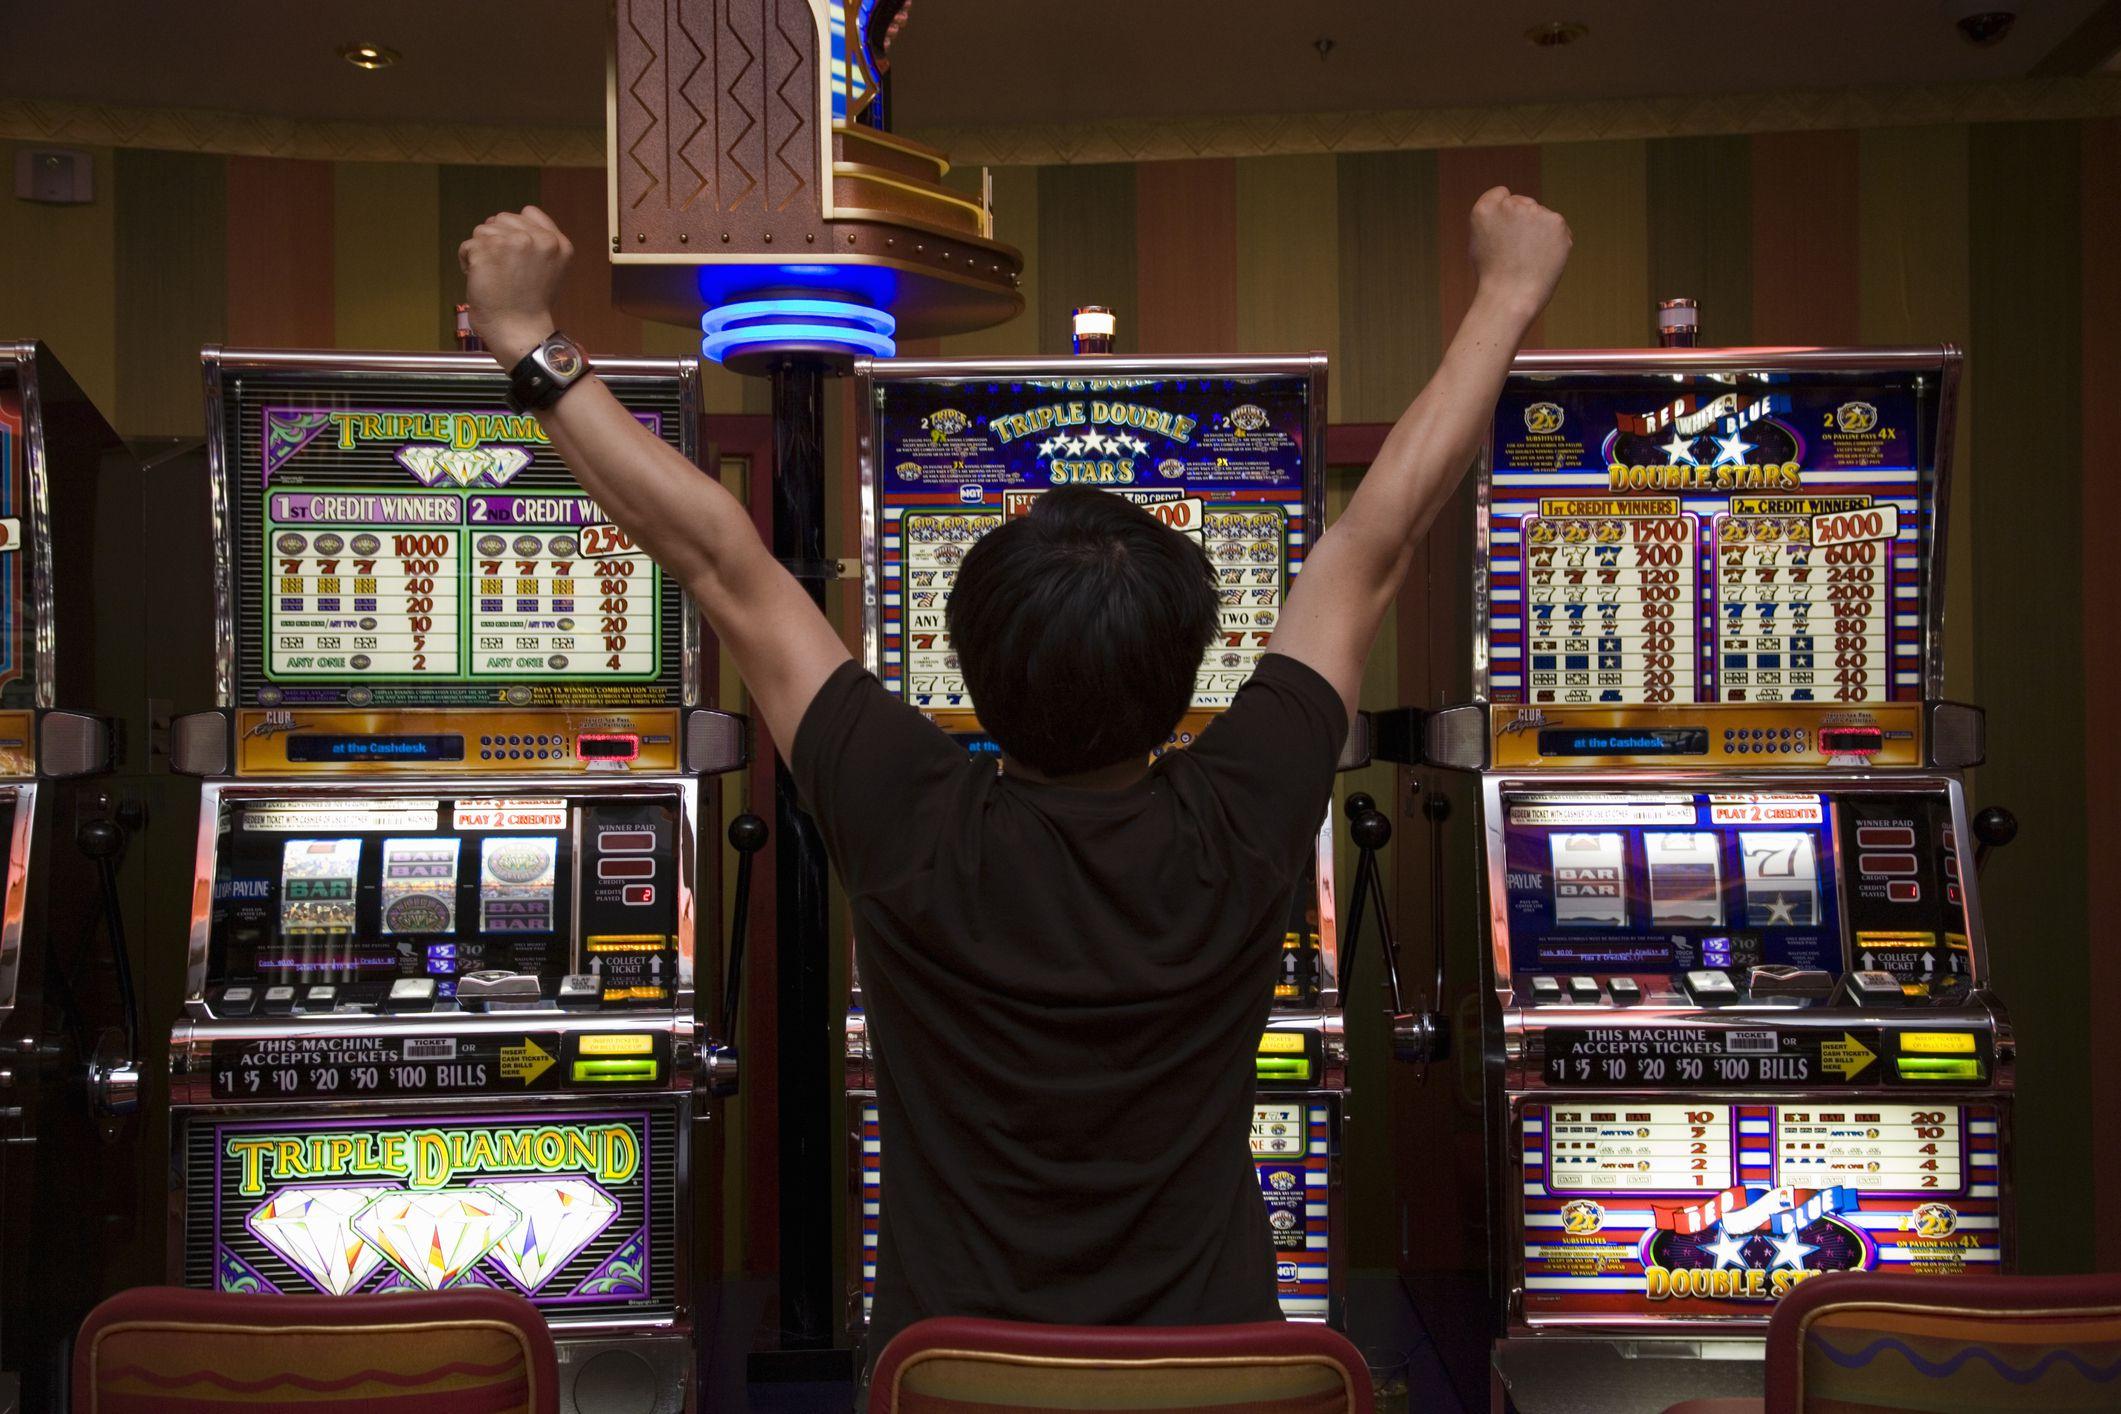 Winning on Slot Games